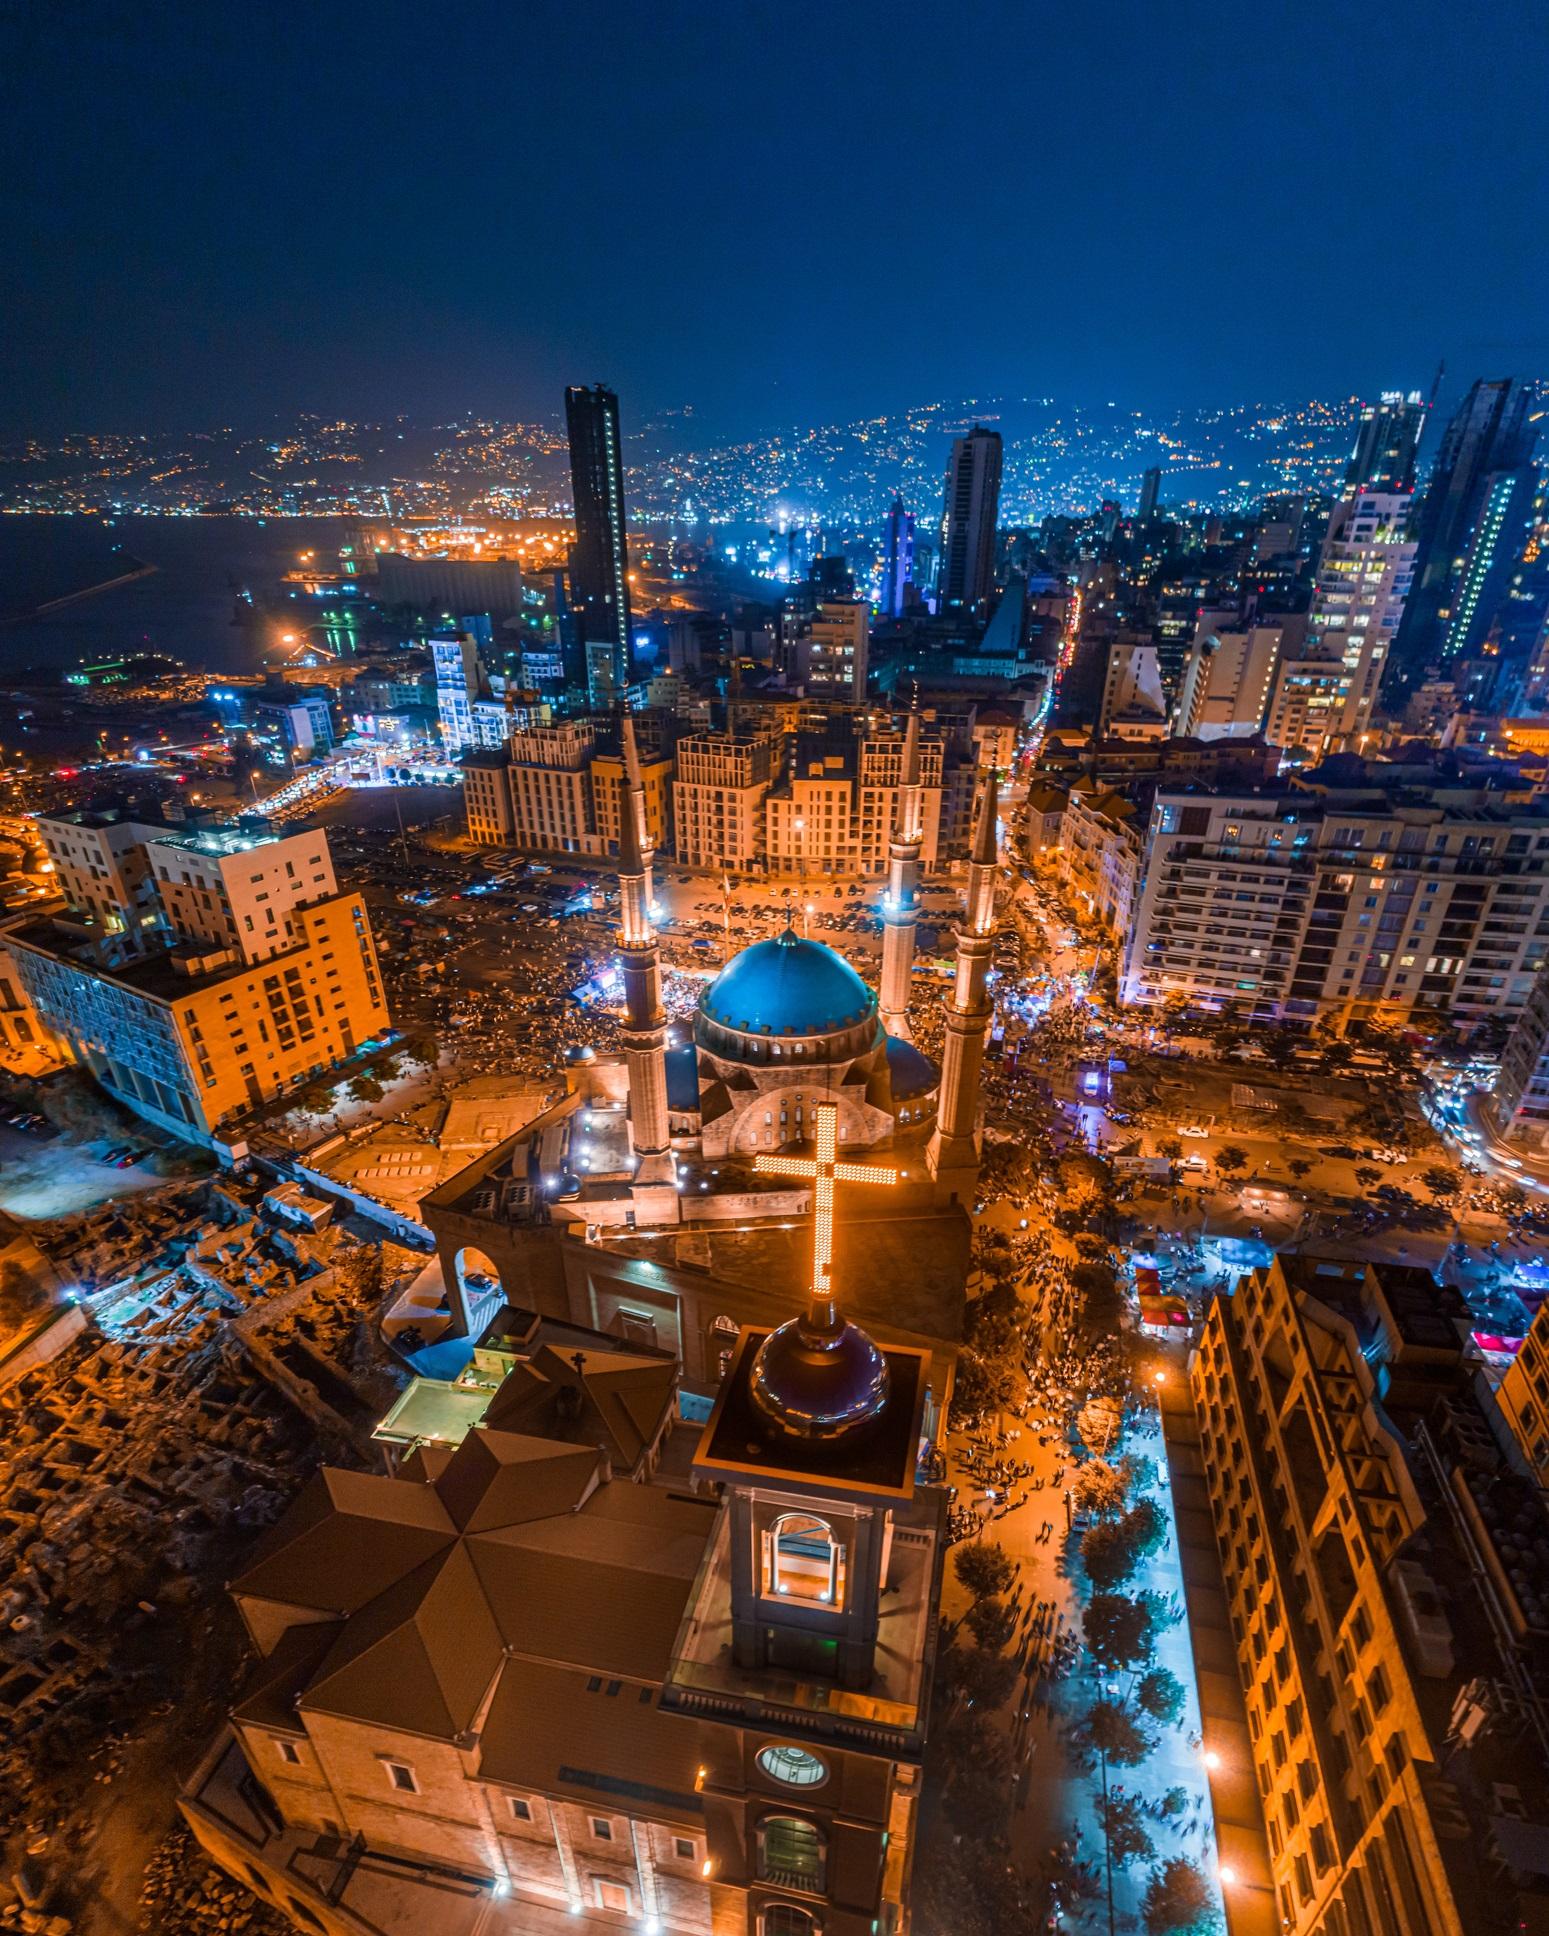 <p><strong>№4 Бейрут, Ливан</strong></p>